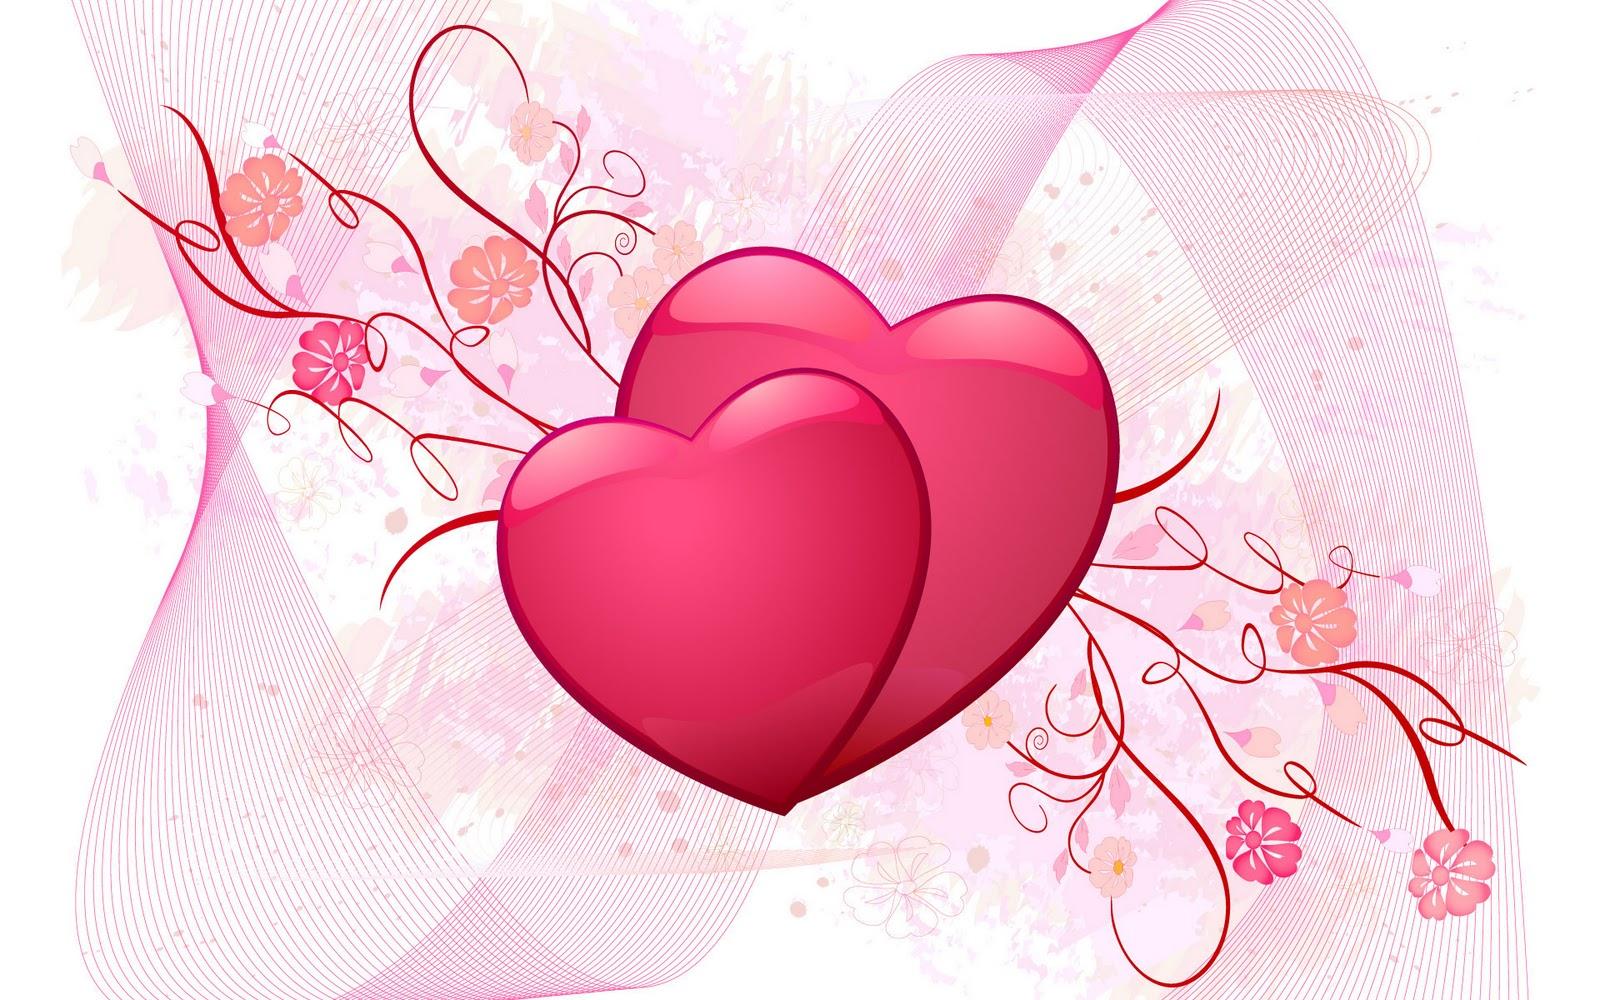 Love Wallpapers, Cute Love Wallpapers, I Love You Wallpaper, Beautiful Love Wallpapers, Couples in Love Wallpaper, Friendship Wallpapers, Relationship Wallpapers, Nice Romantic Wallpapers, Most Beautiful Wallpapers for Desktop